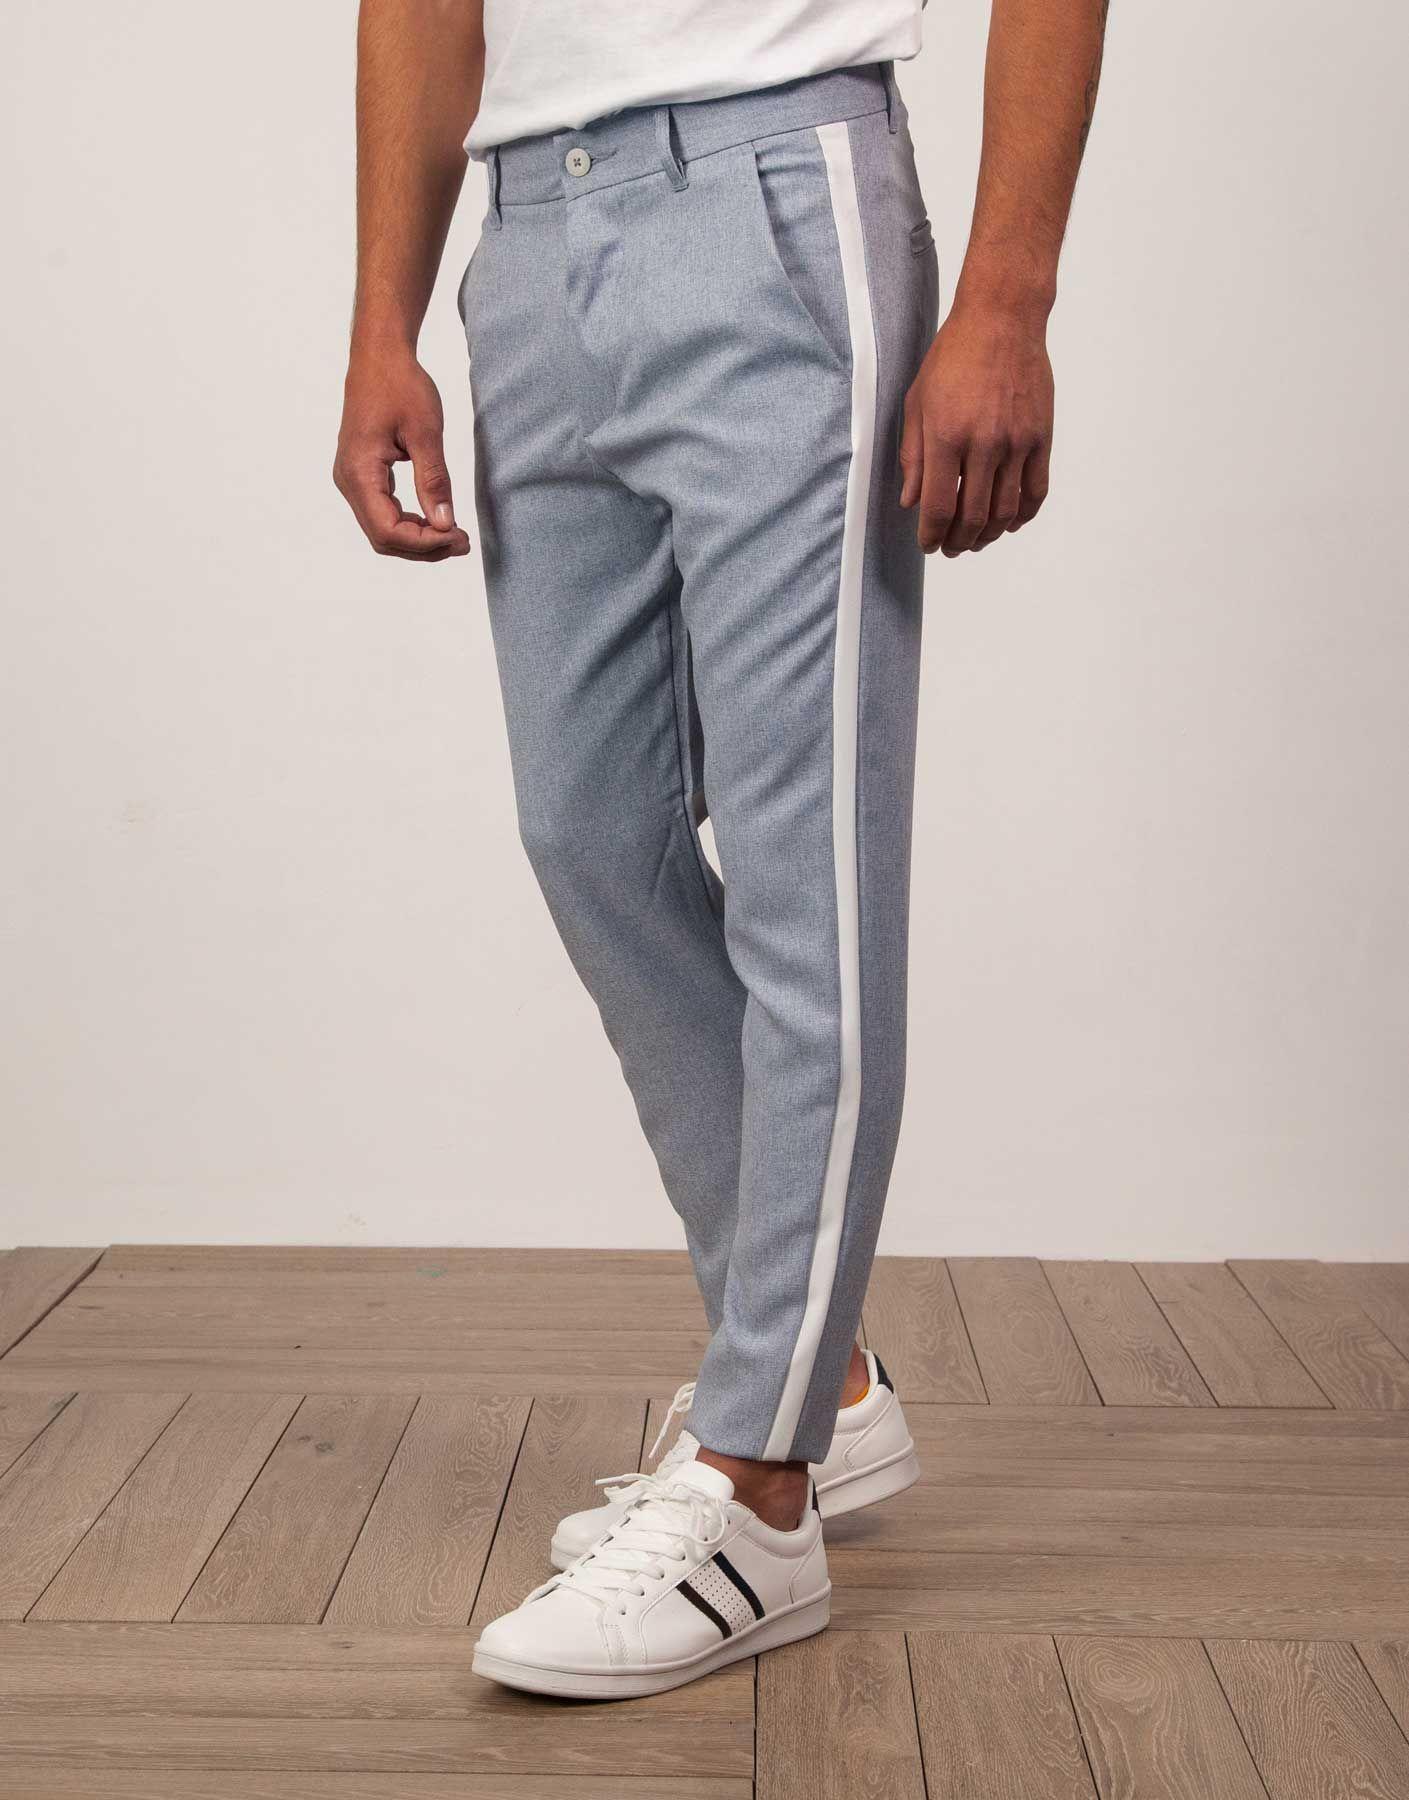 Pantalon Vestir Franja Lateral Contraste Azul Jvz Stripes Trends Fashion Clothes